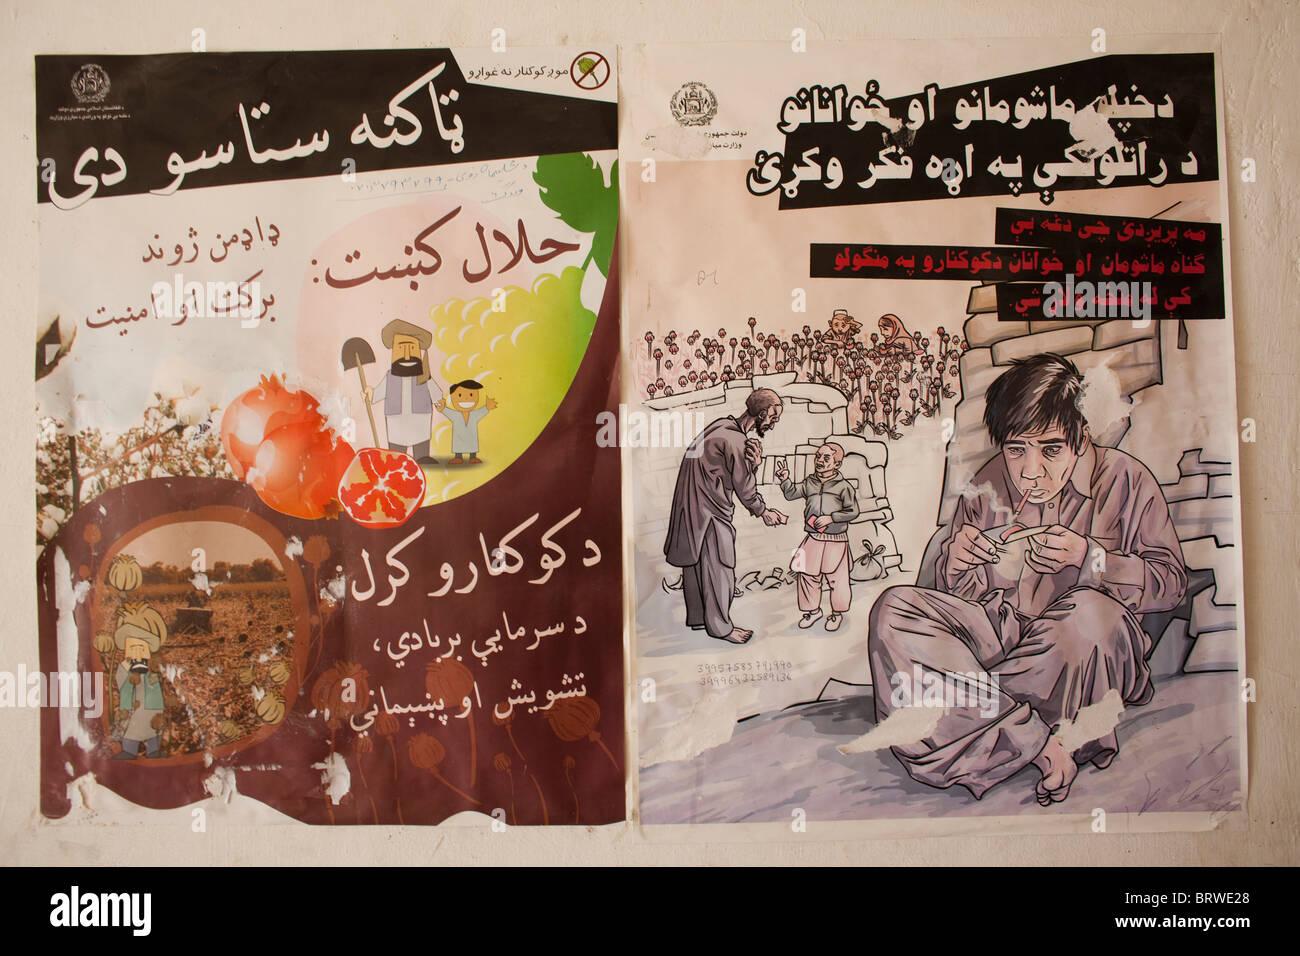 poster against drug usage in Afghanistan - Stock Image